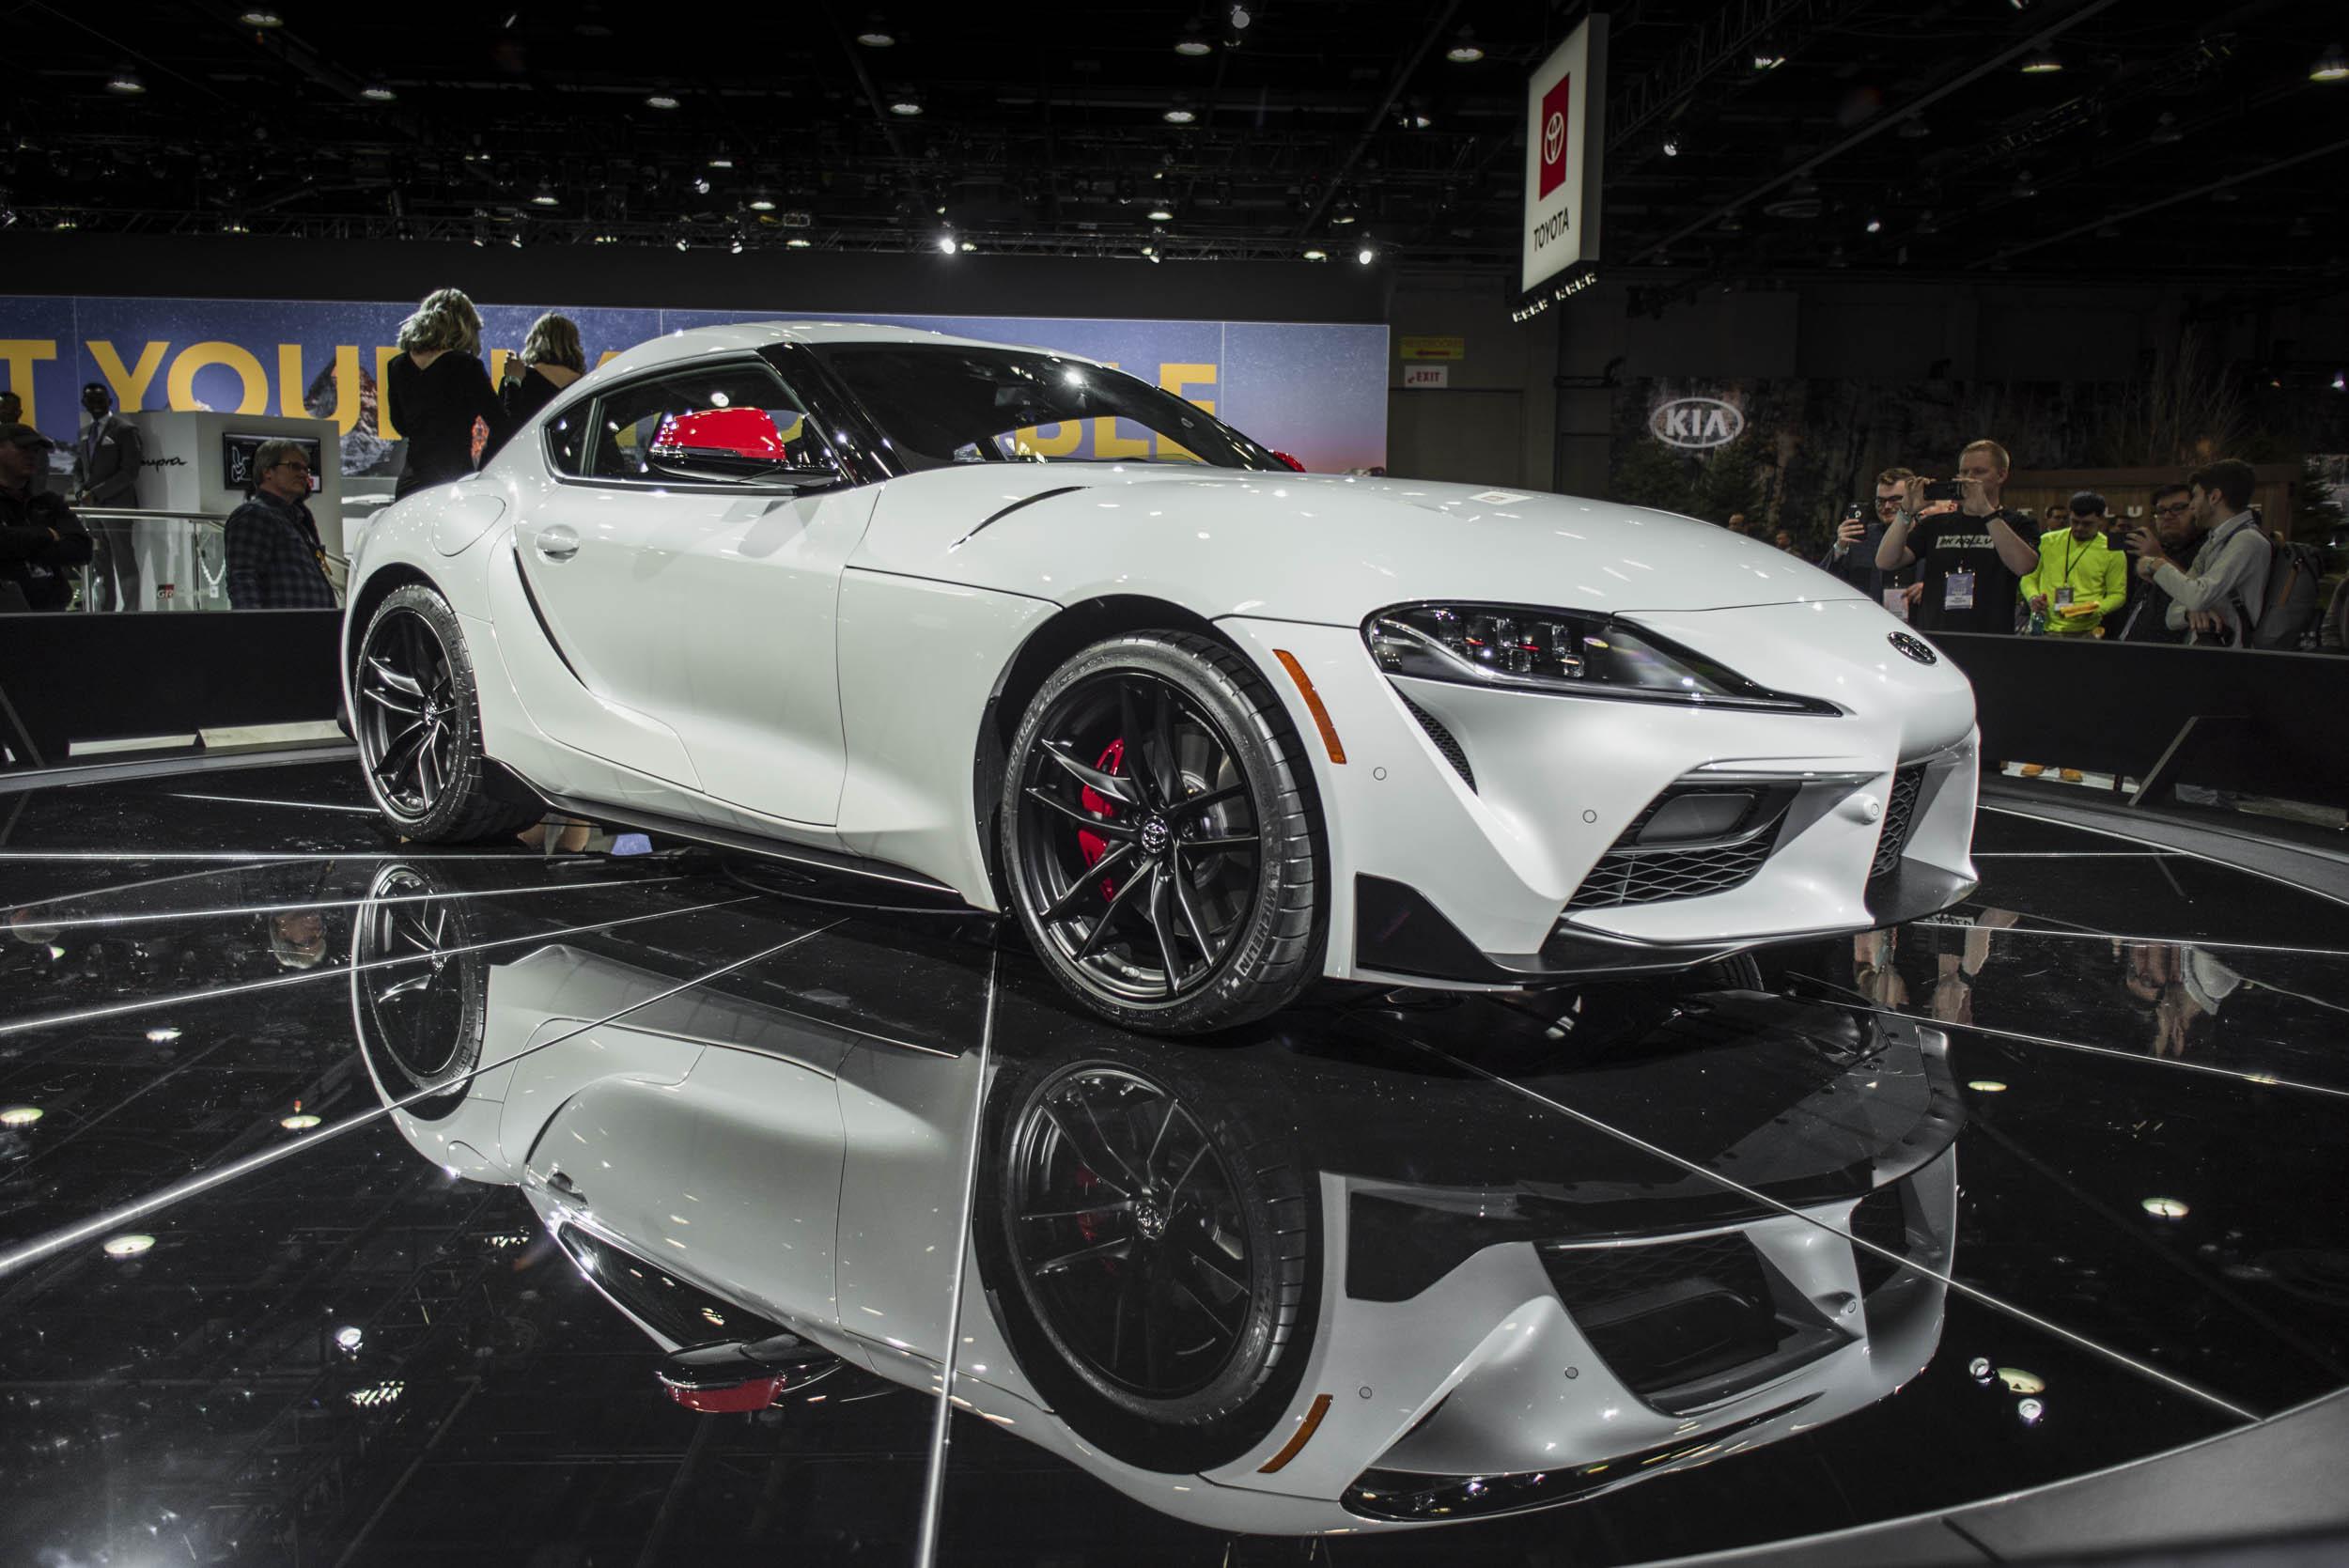 2020 Toyota Supra front 3/4